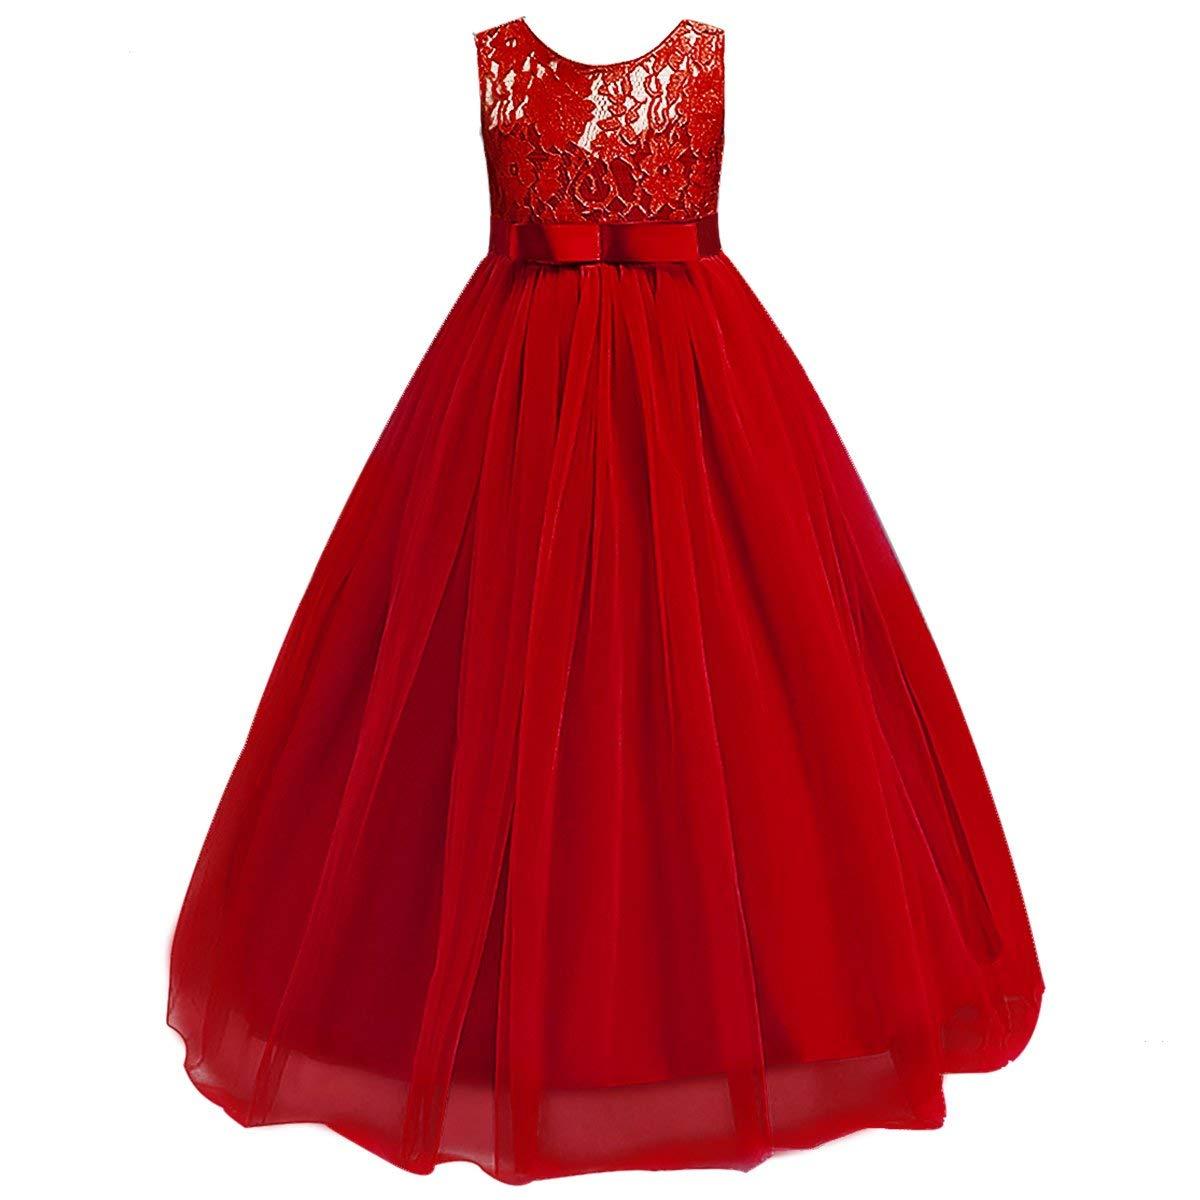 Big Girl Vintage Lace Junior vestido de dama de honor Dance Ball desfile Maxi Gown Floor Long para fiesta de boda